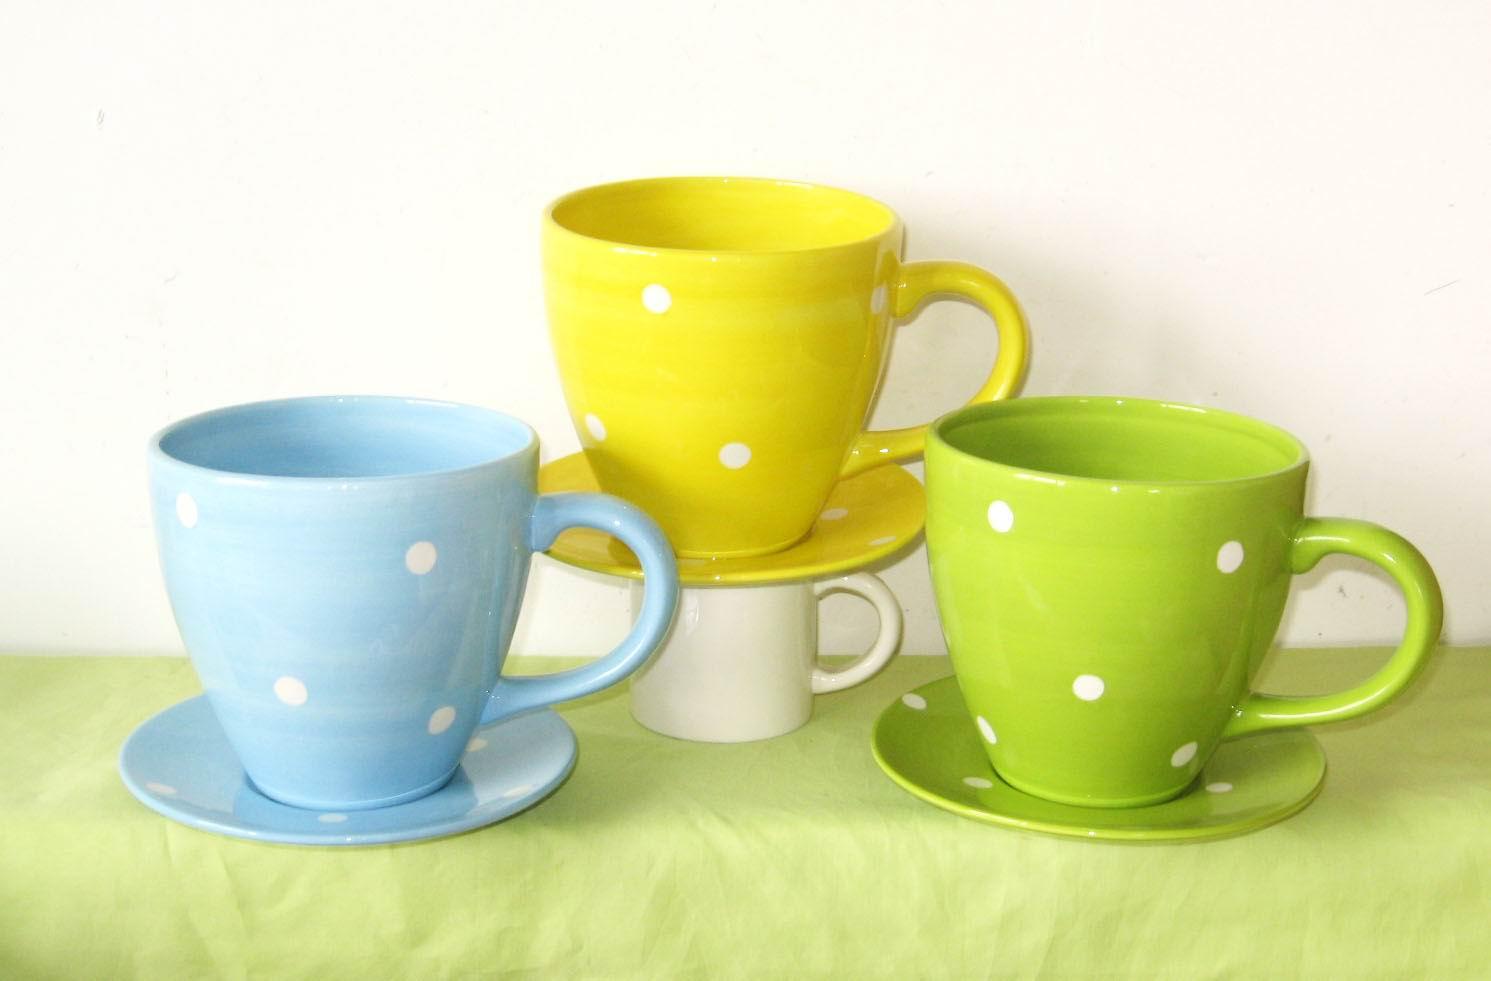 Ceramic flower pots with flowers for 6 ceramic flower pots